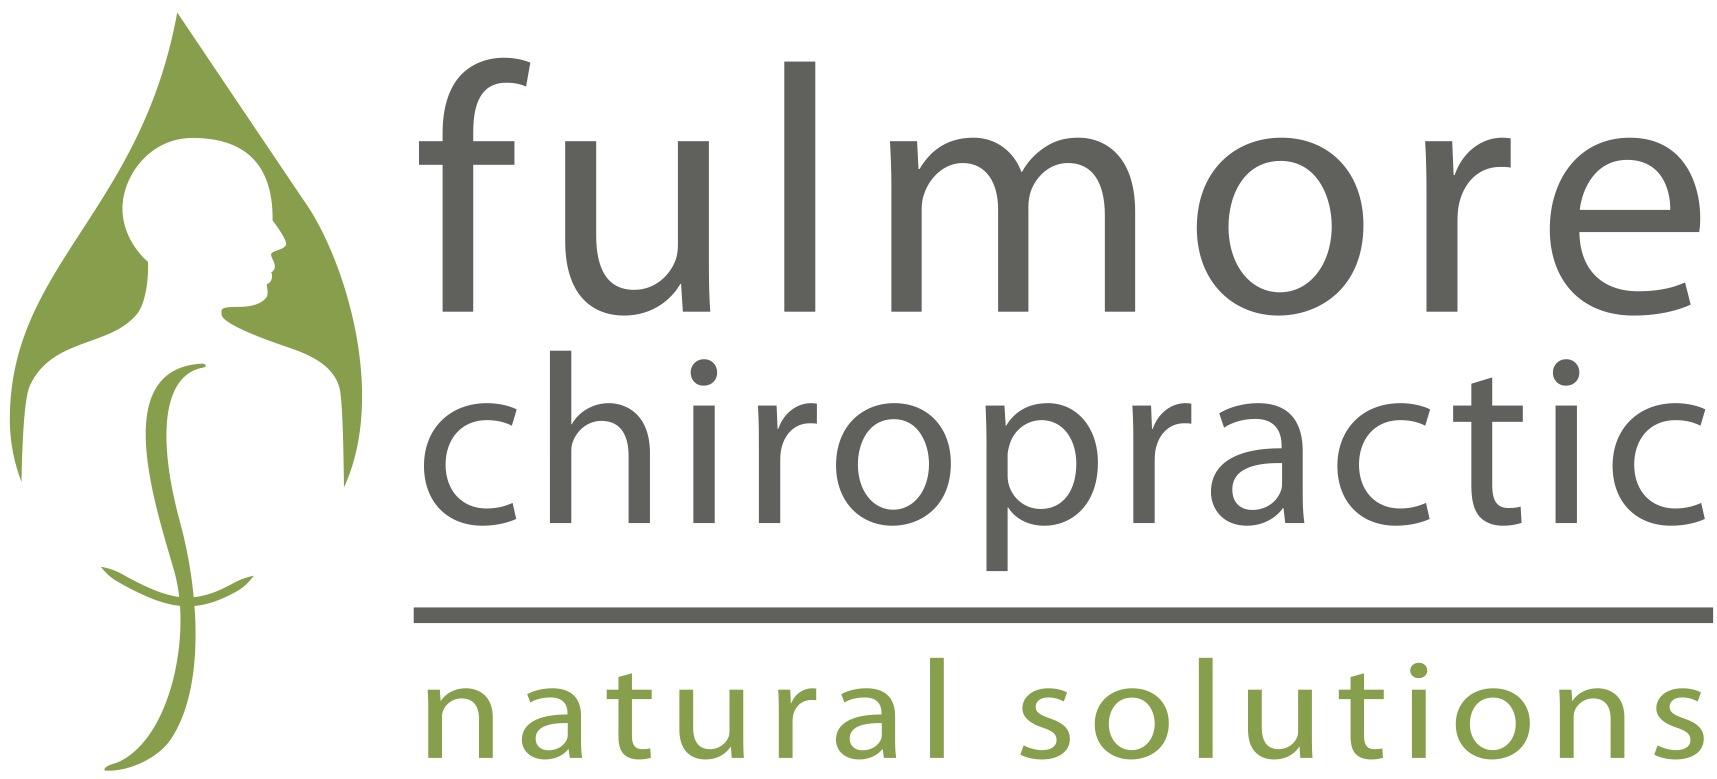 Dr. Fulmore Logo